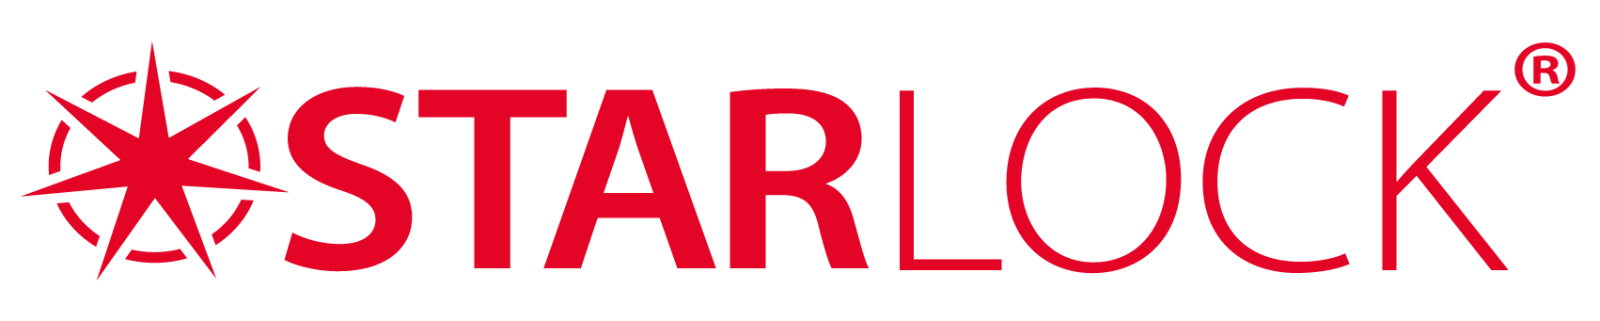 Starlock Air Cushion Logo